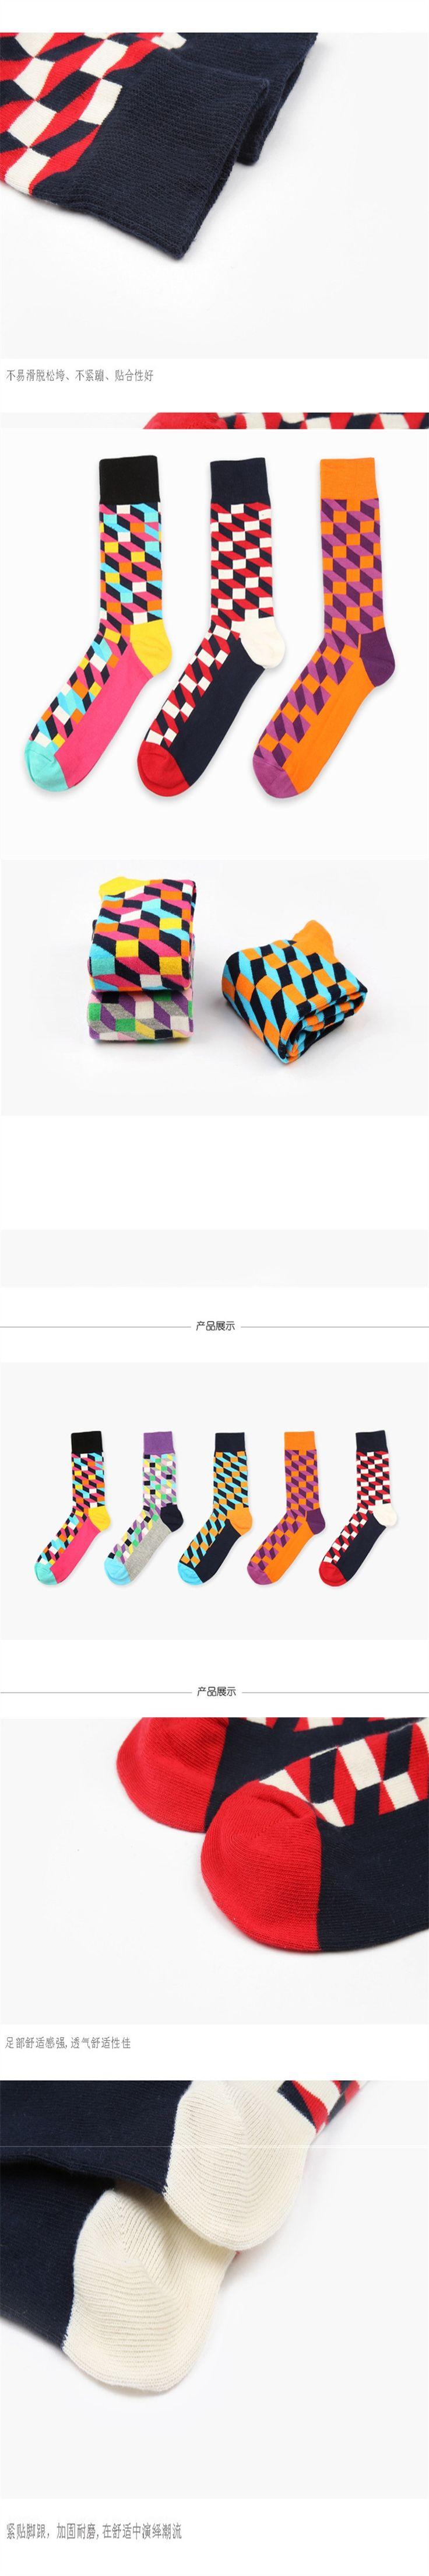 Happy socks lattice socks men cotton wholesale calcetines mujerfunny  meia masculina calze uomo chaussette femme calze donna